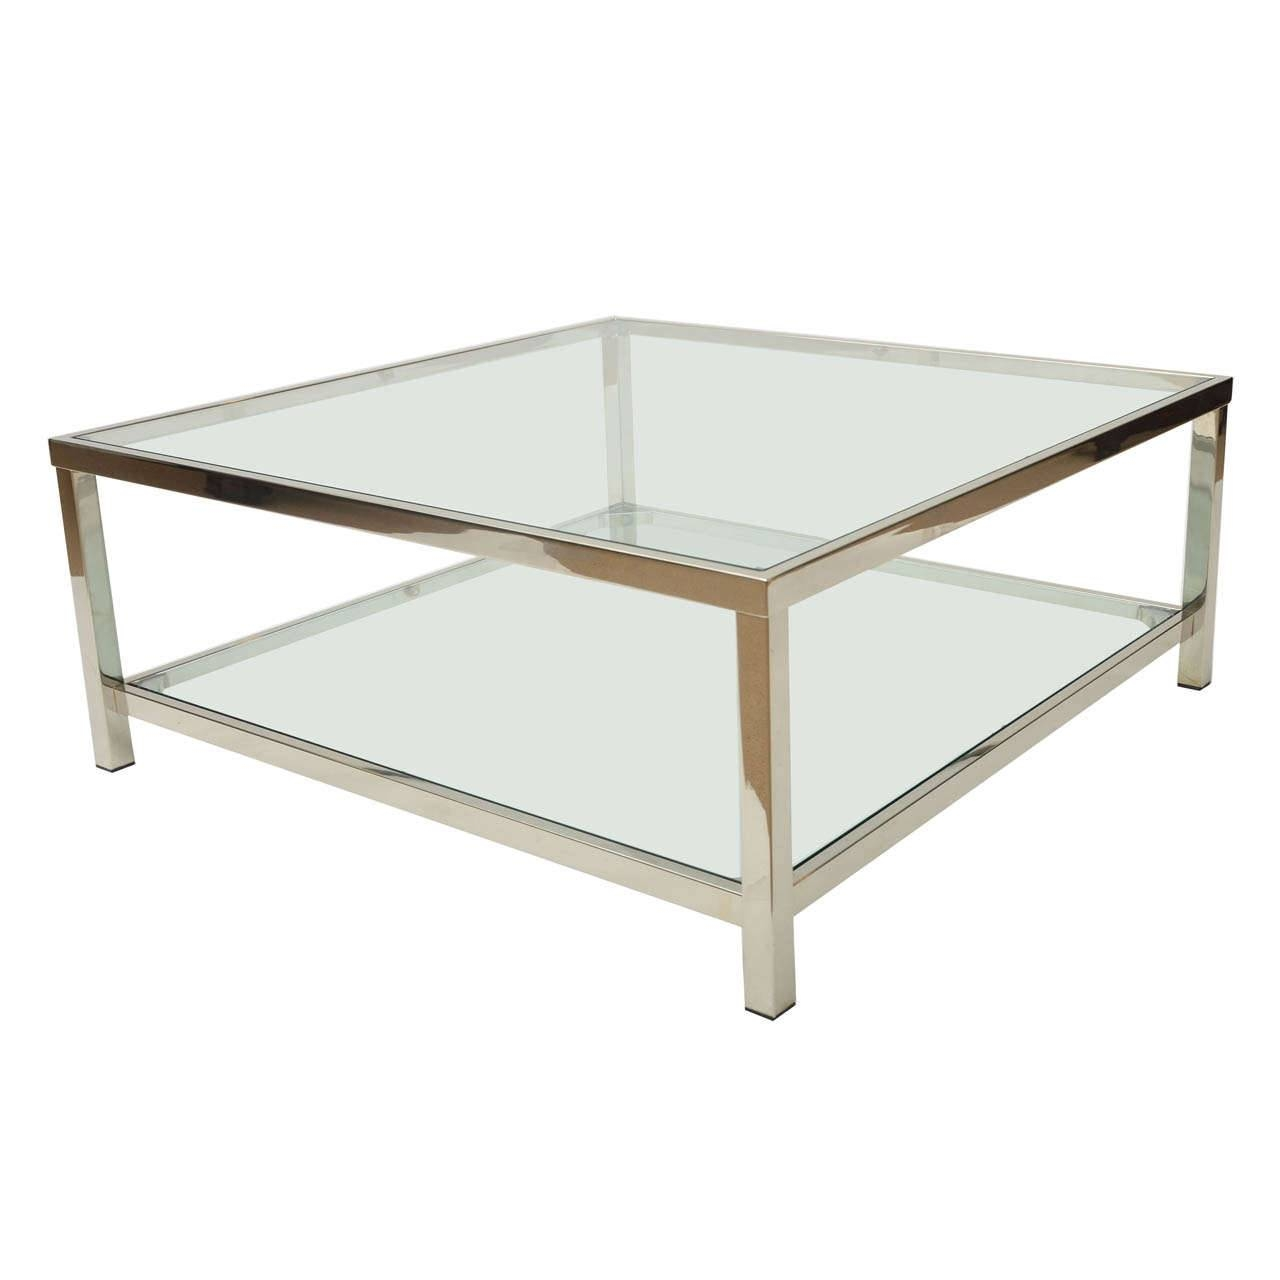 Coffee Table: Astonishing Chrome And Glass Coffee Table Ikea inside Glass Square Coffee Tables (Image 6 of 30)